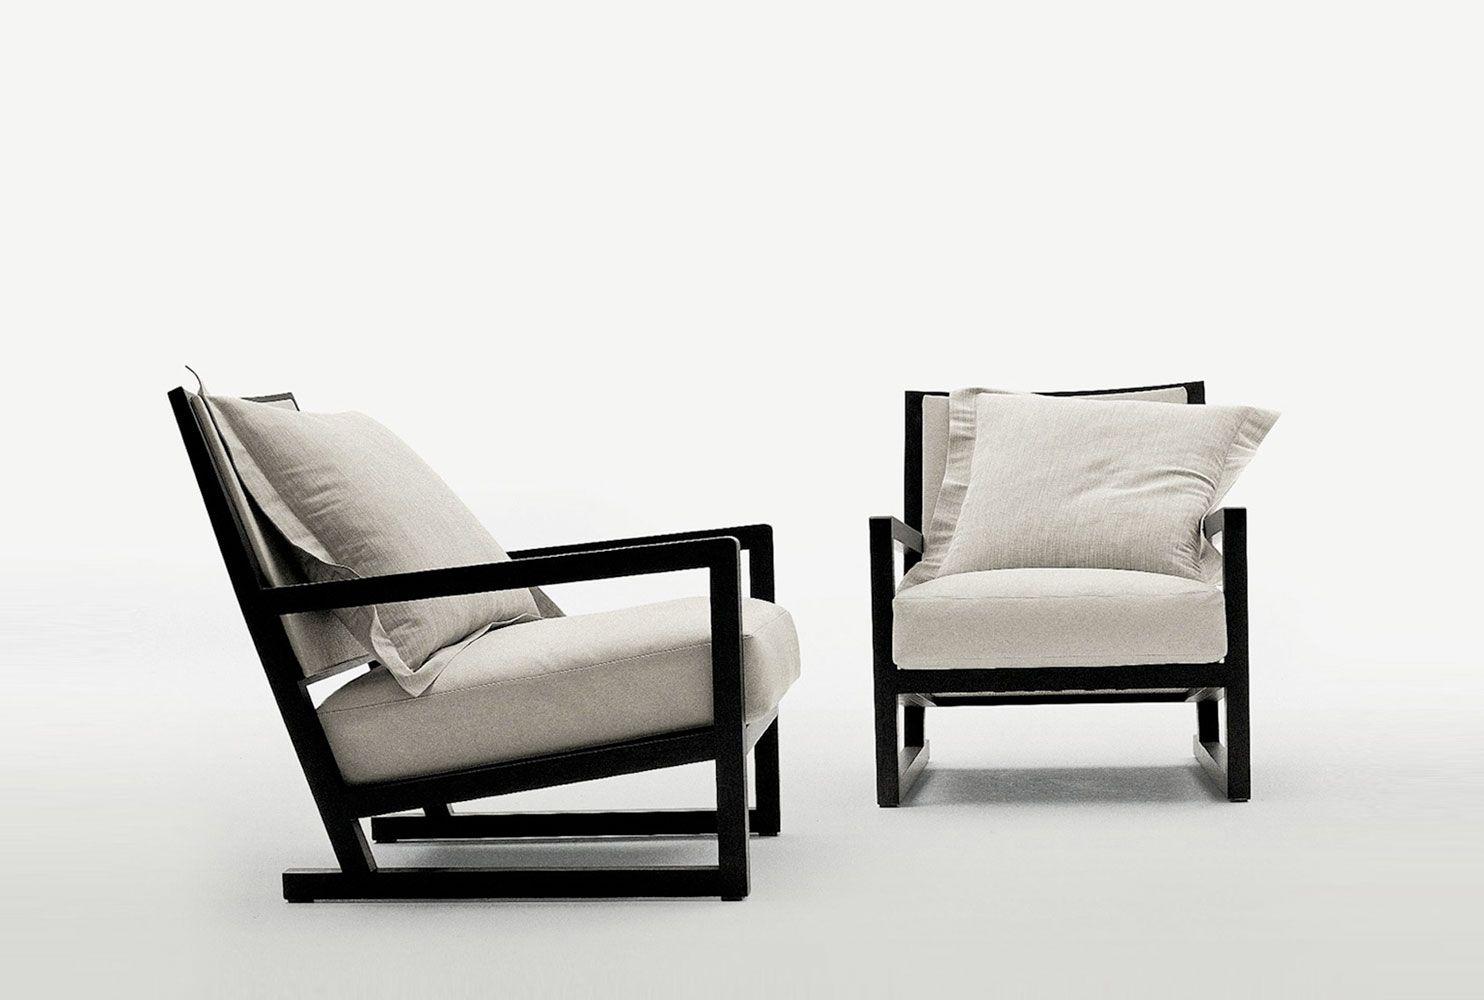 Butacas clio colecci n maxalto dise o antonio citterio calle 54 muebles muebles - Butacas individuales ...